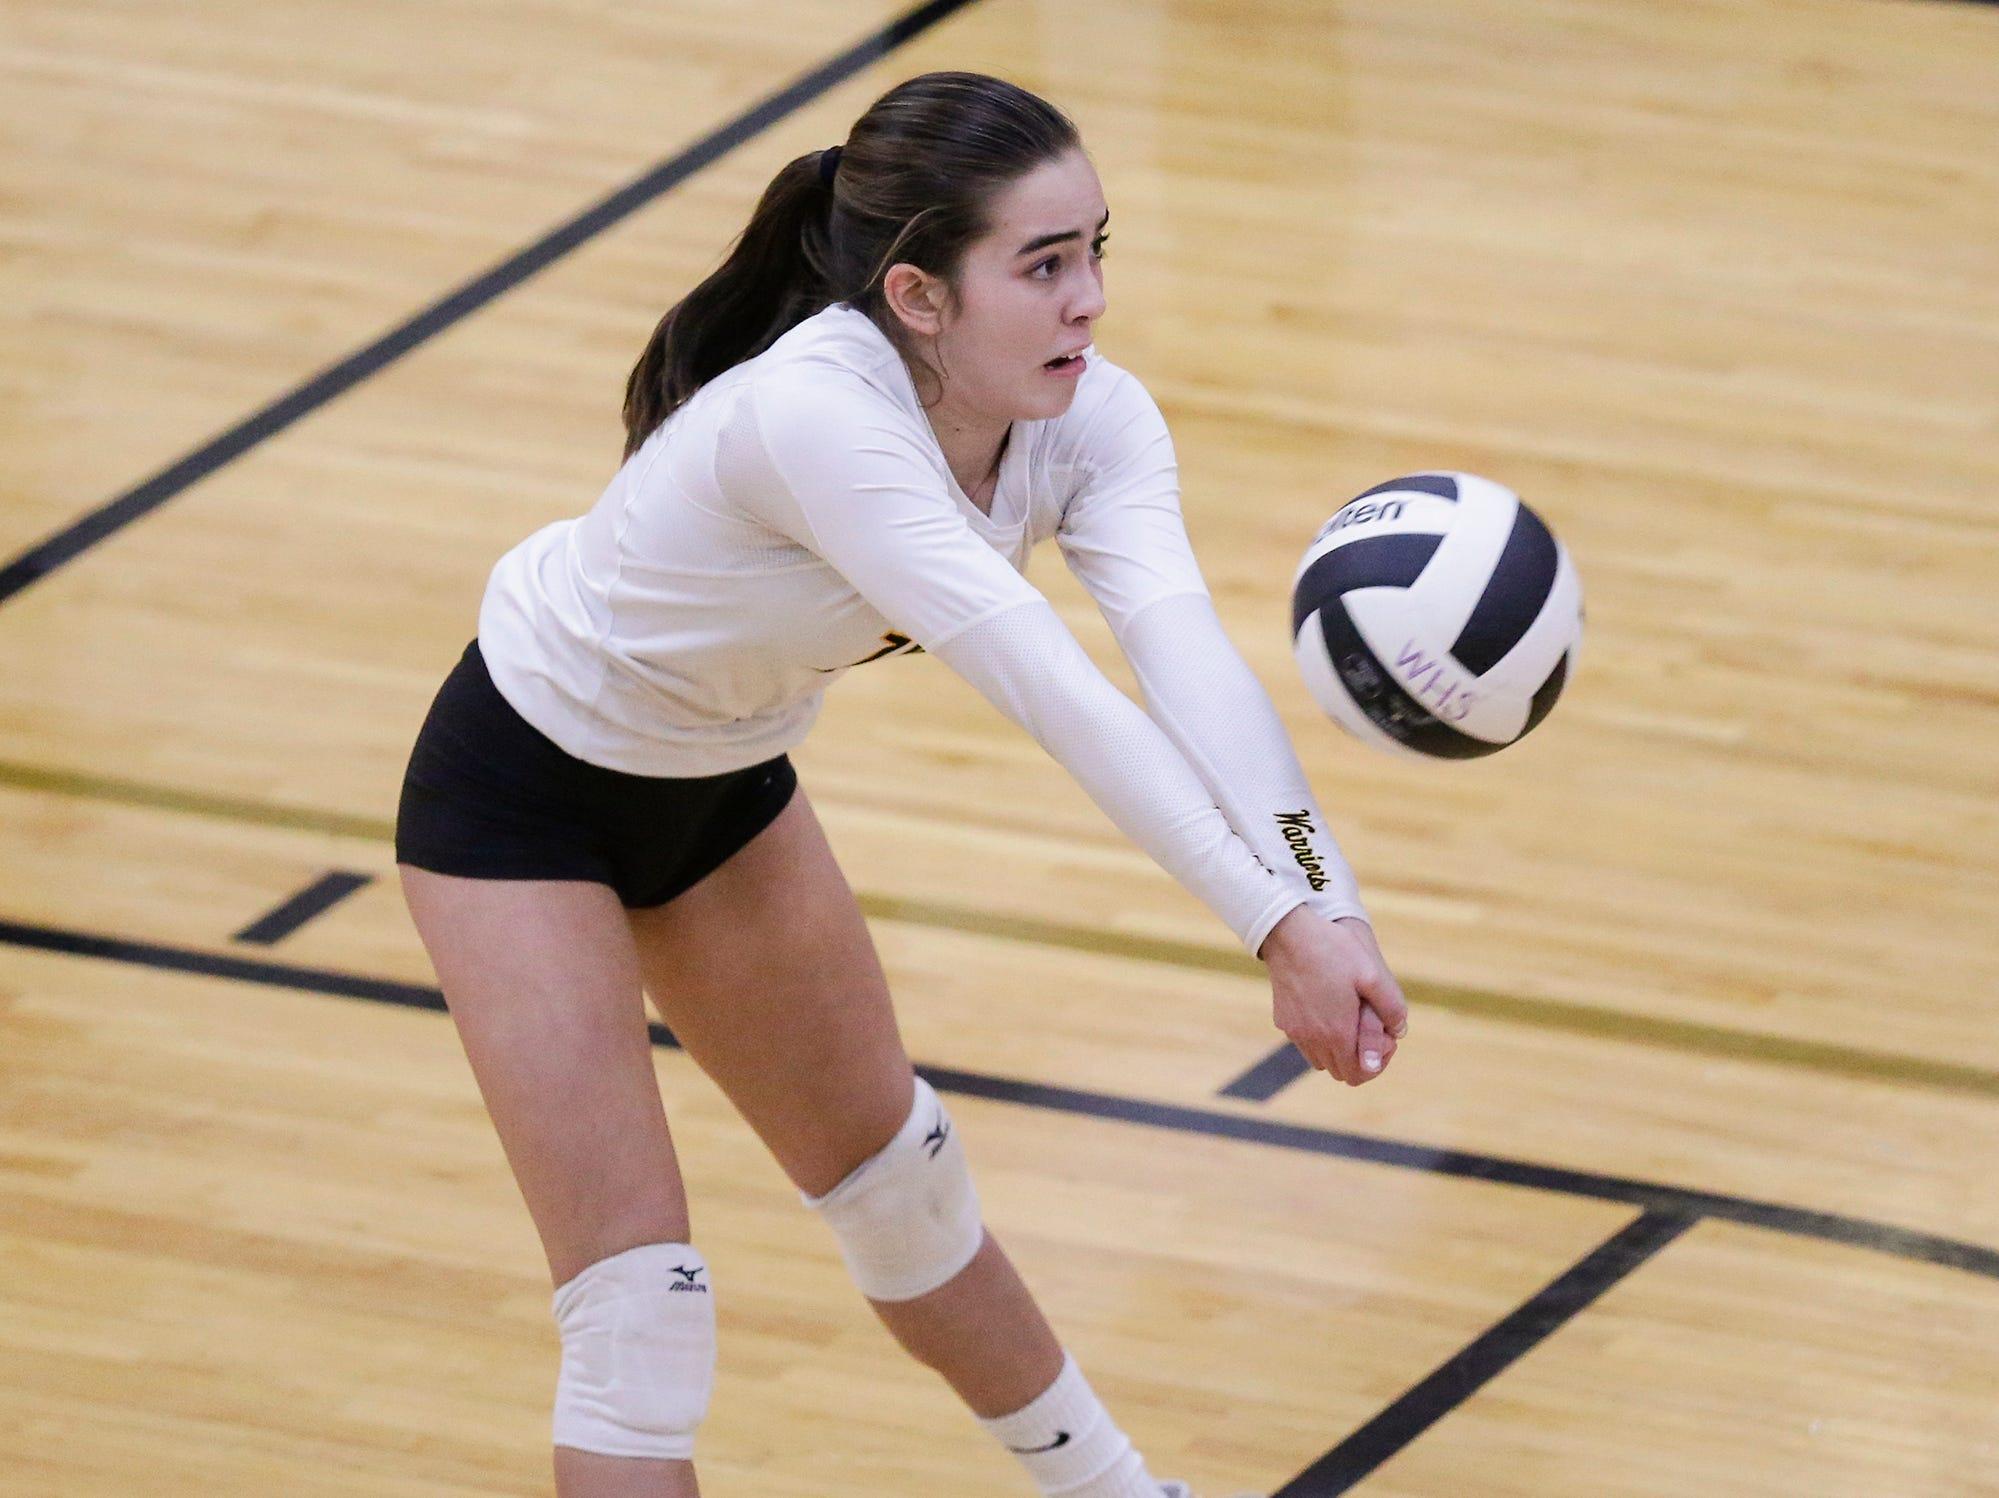 Waupun High School volleyball's Hannah Scholten hits the ball against Berlin High School during their WIAA regional quarter-final playoff game Tuesday, Oct. 16, 2018, in Waupun.